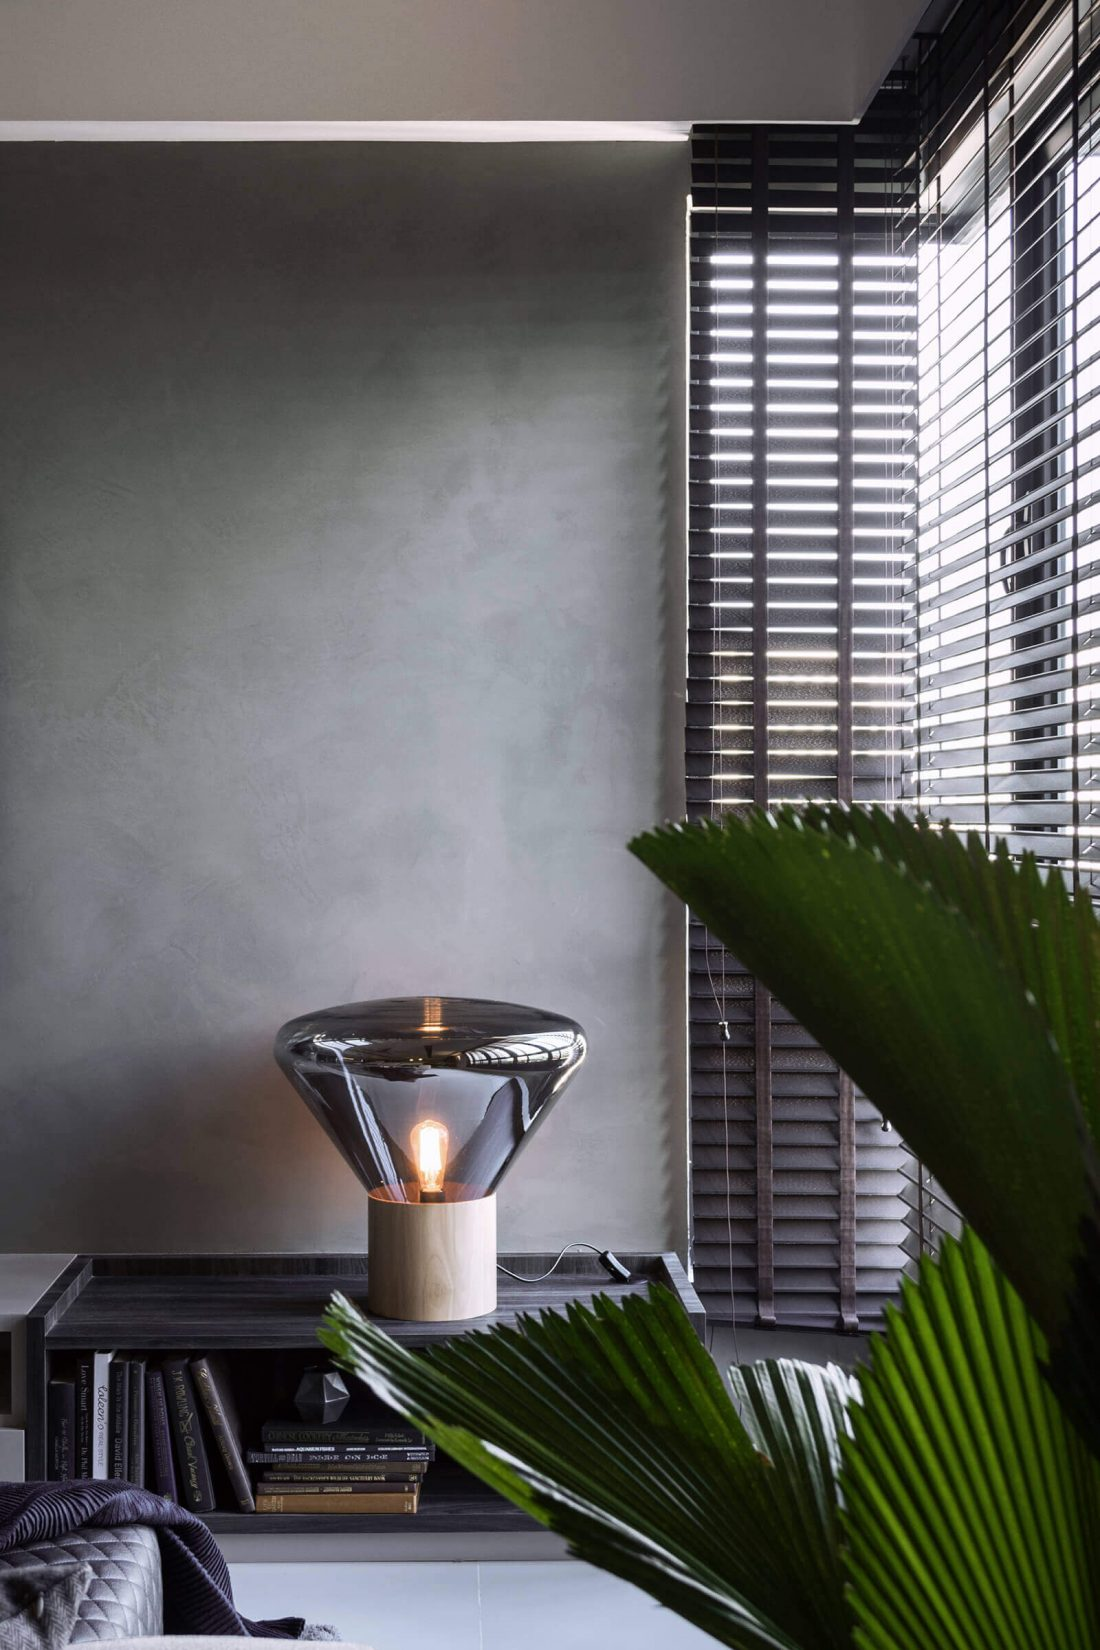 Interior Design Raffel Tower Penang Malaysia Living v3